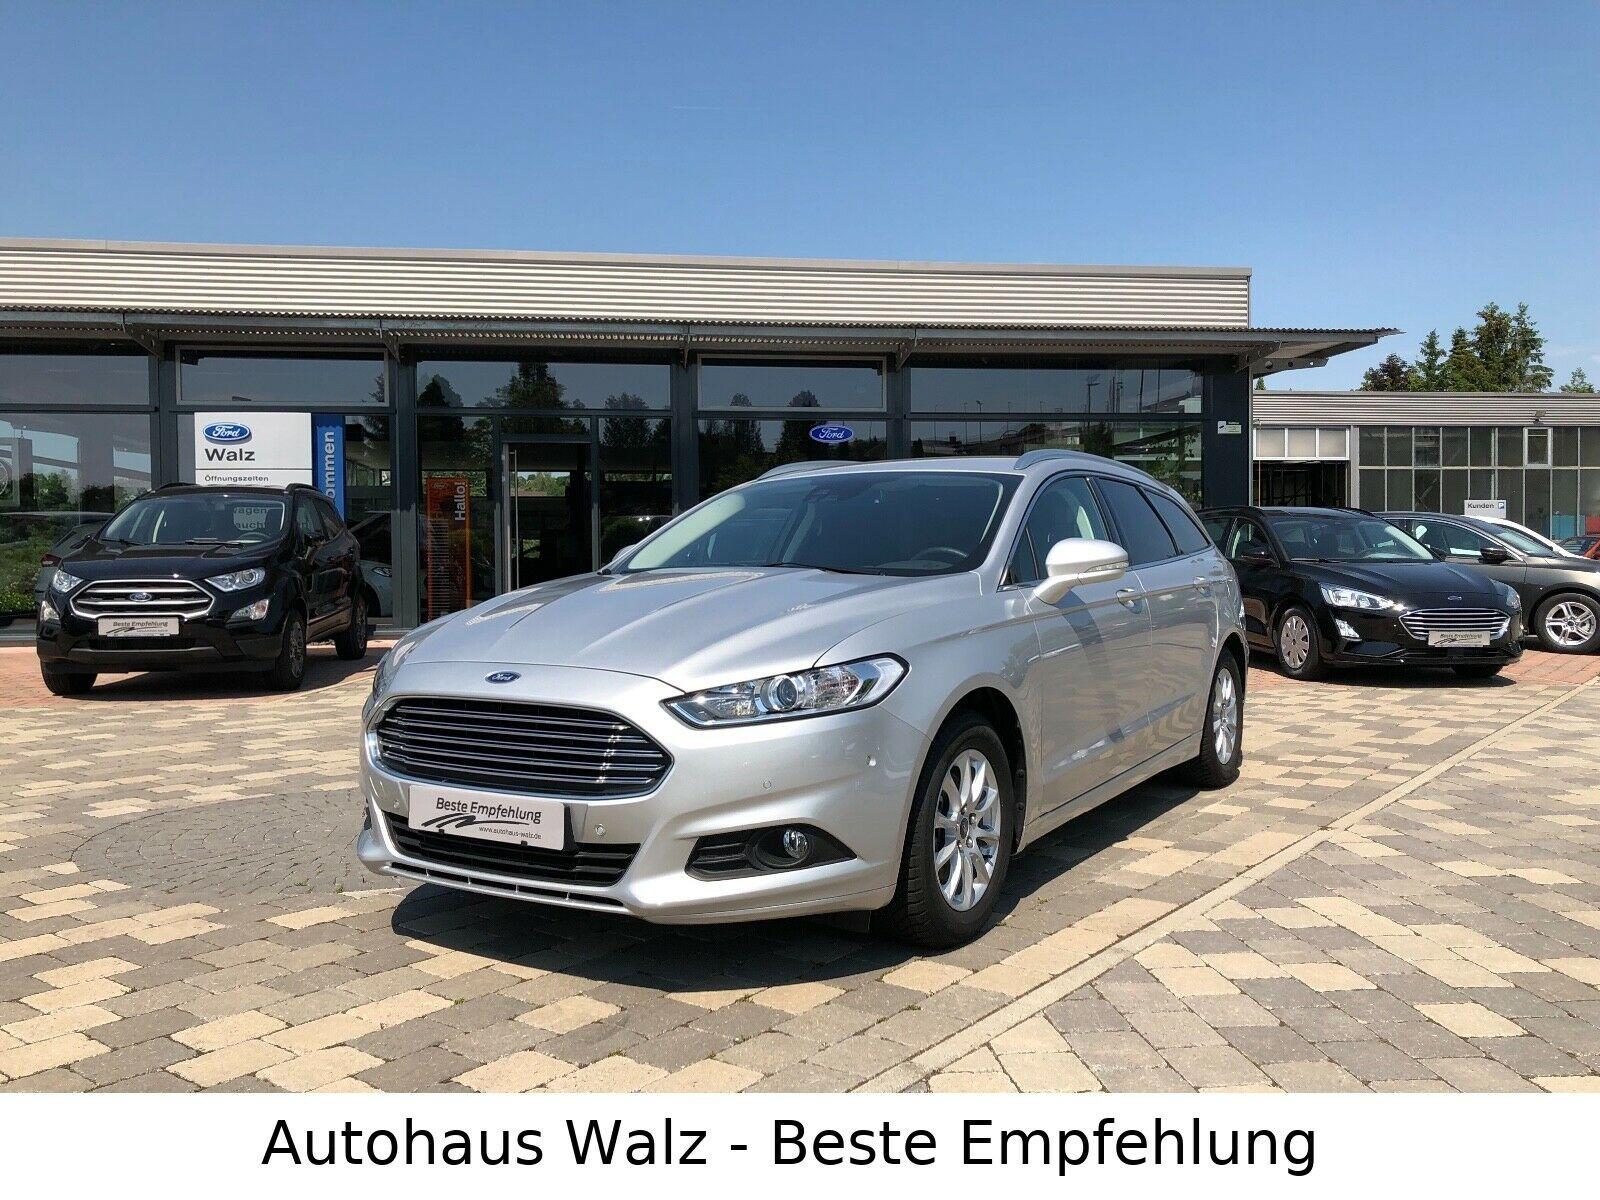 Ford Mondeo 1 5 Ecoboost Business Gebraucht Kaufen In Nagold Preis 17990 Eur Int Nr 68433